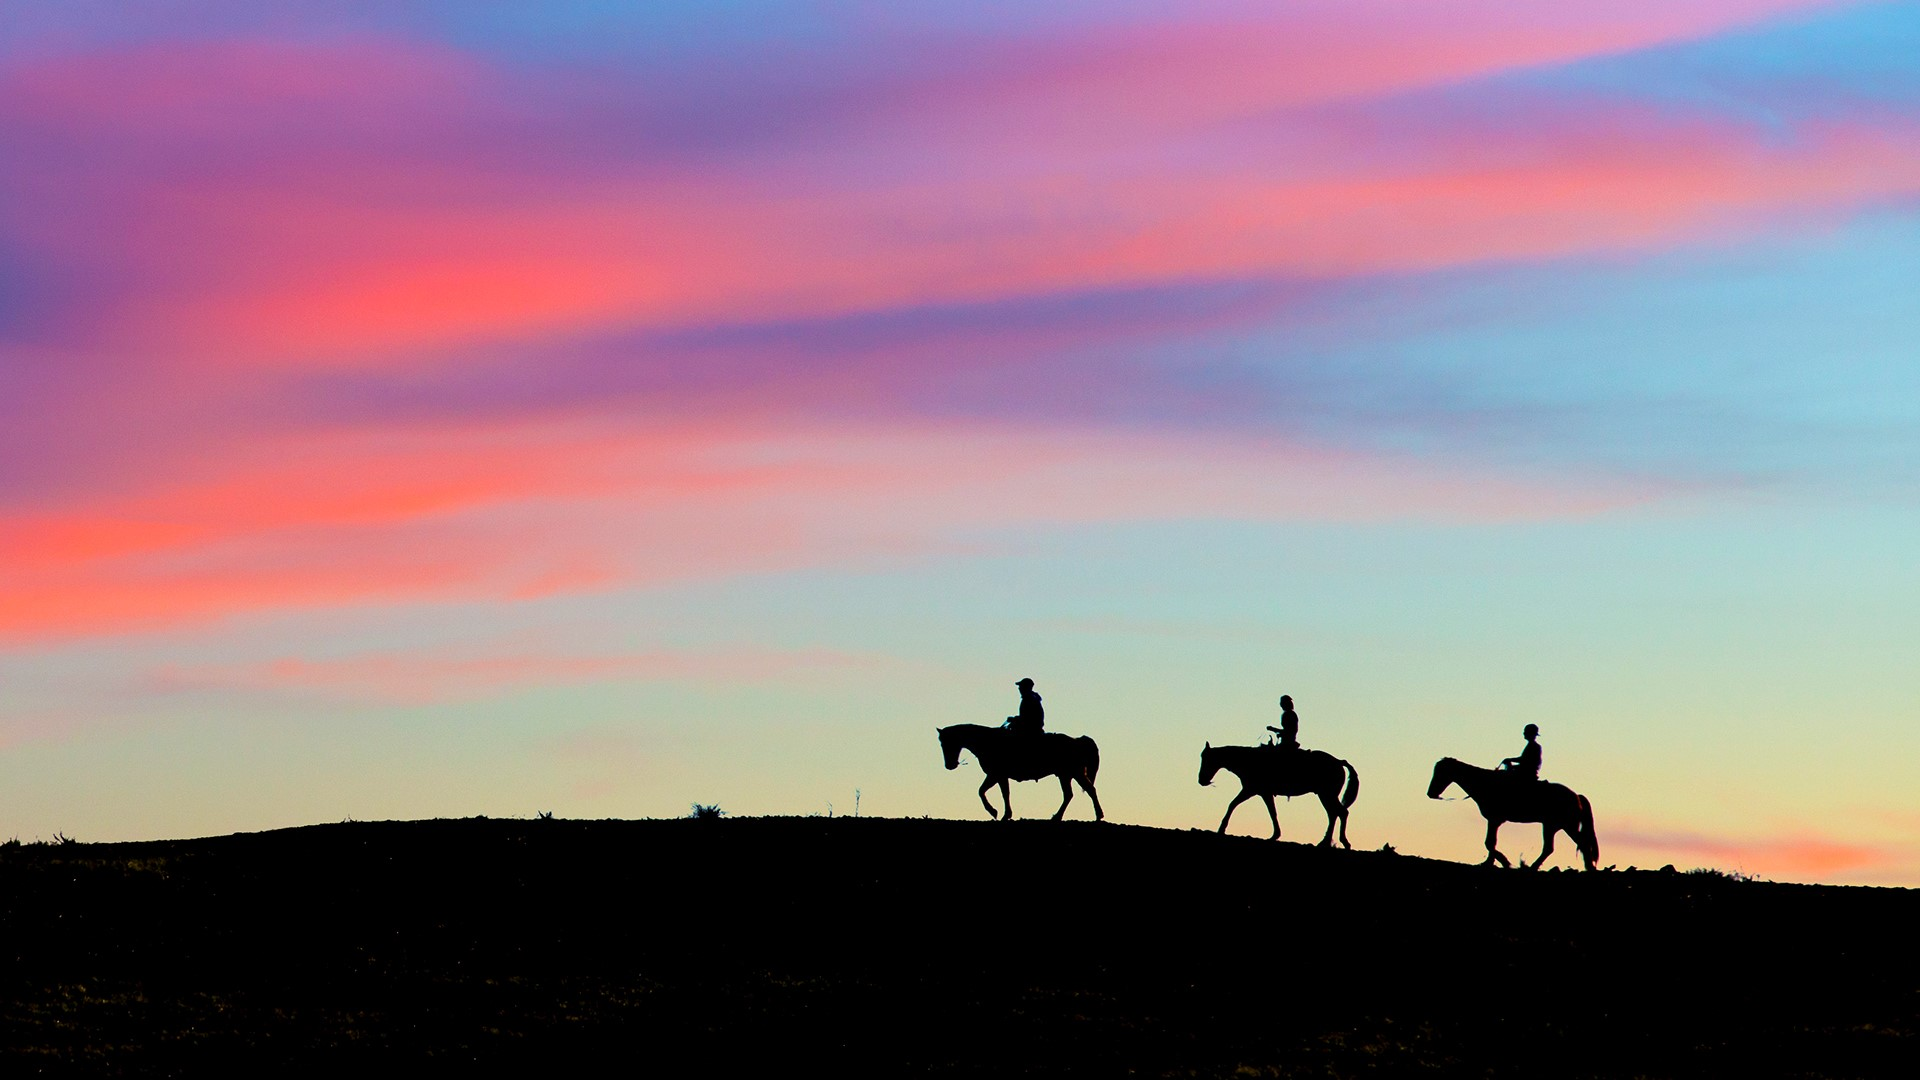 Horseback Riders In The Santa Monica Mountains California Usa